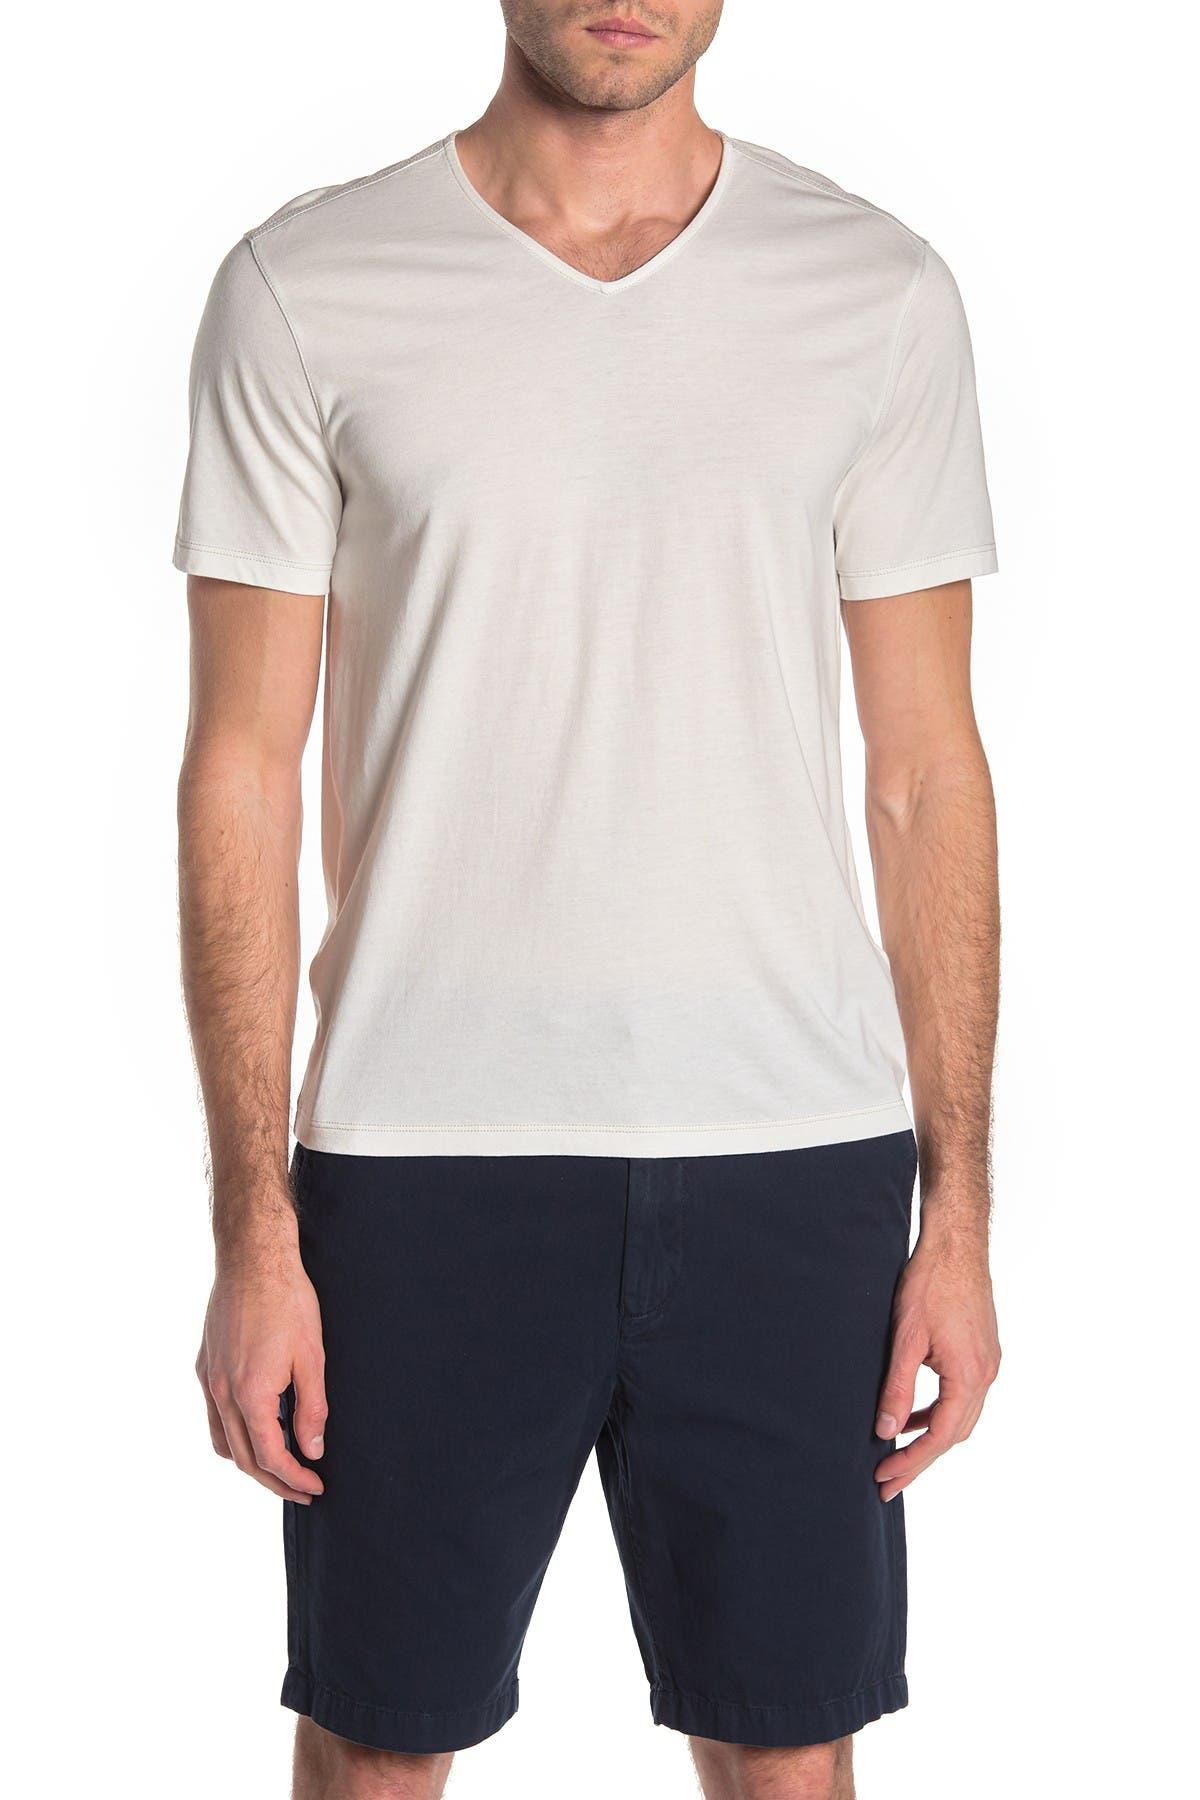 John Varvatos Star USA Men/'s Short Sleeve V Neck Tee Shirt Raw Cut Edges Black L